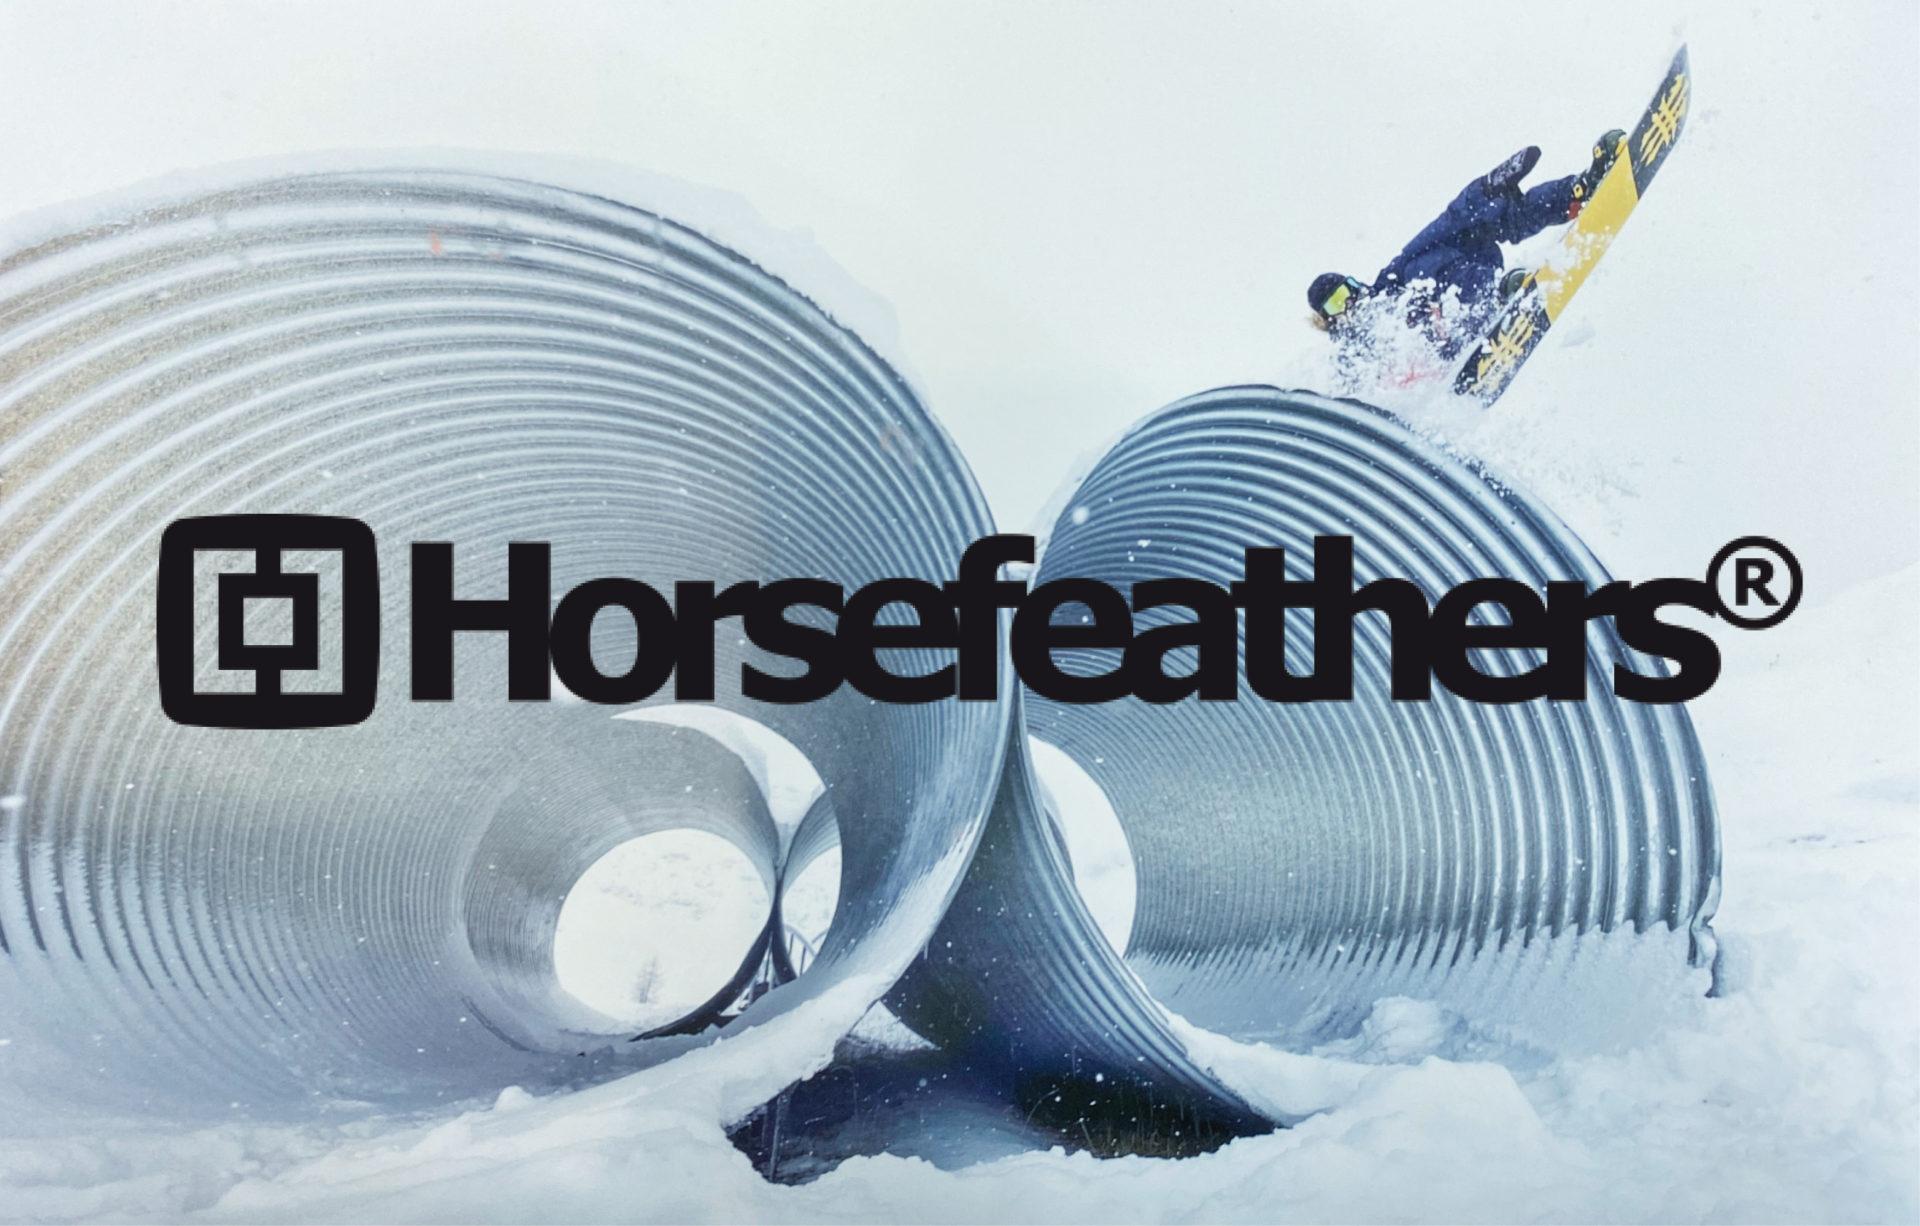 20-21 NEWモデルウェア【Horsefeathers】